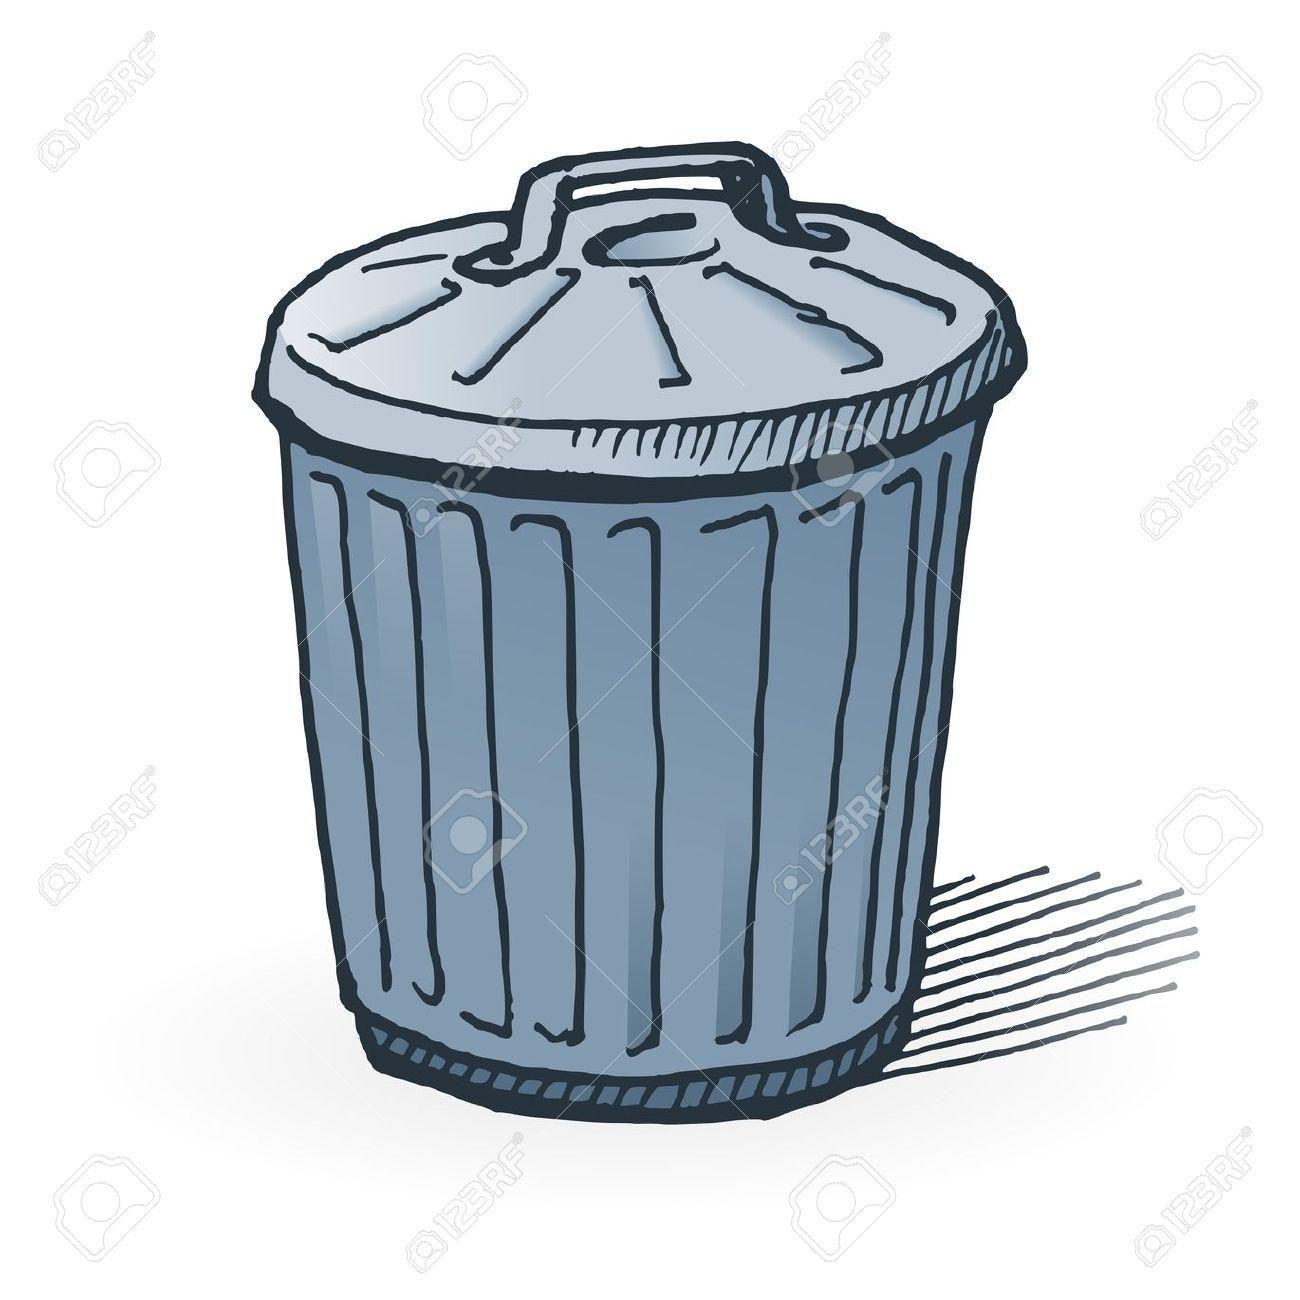 Trash Bin Drawing.